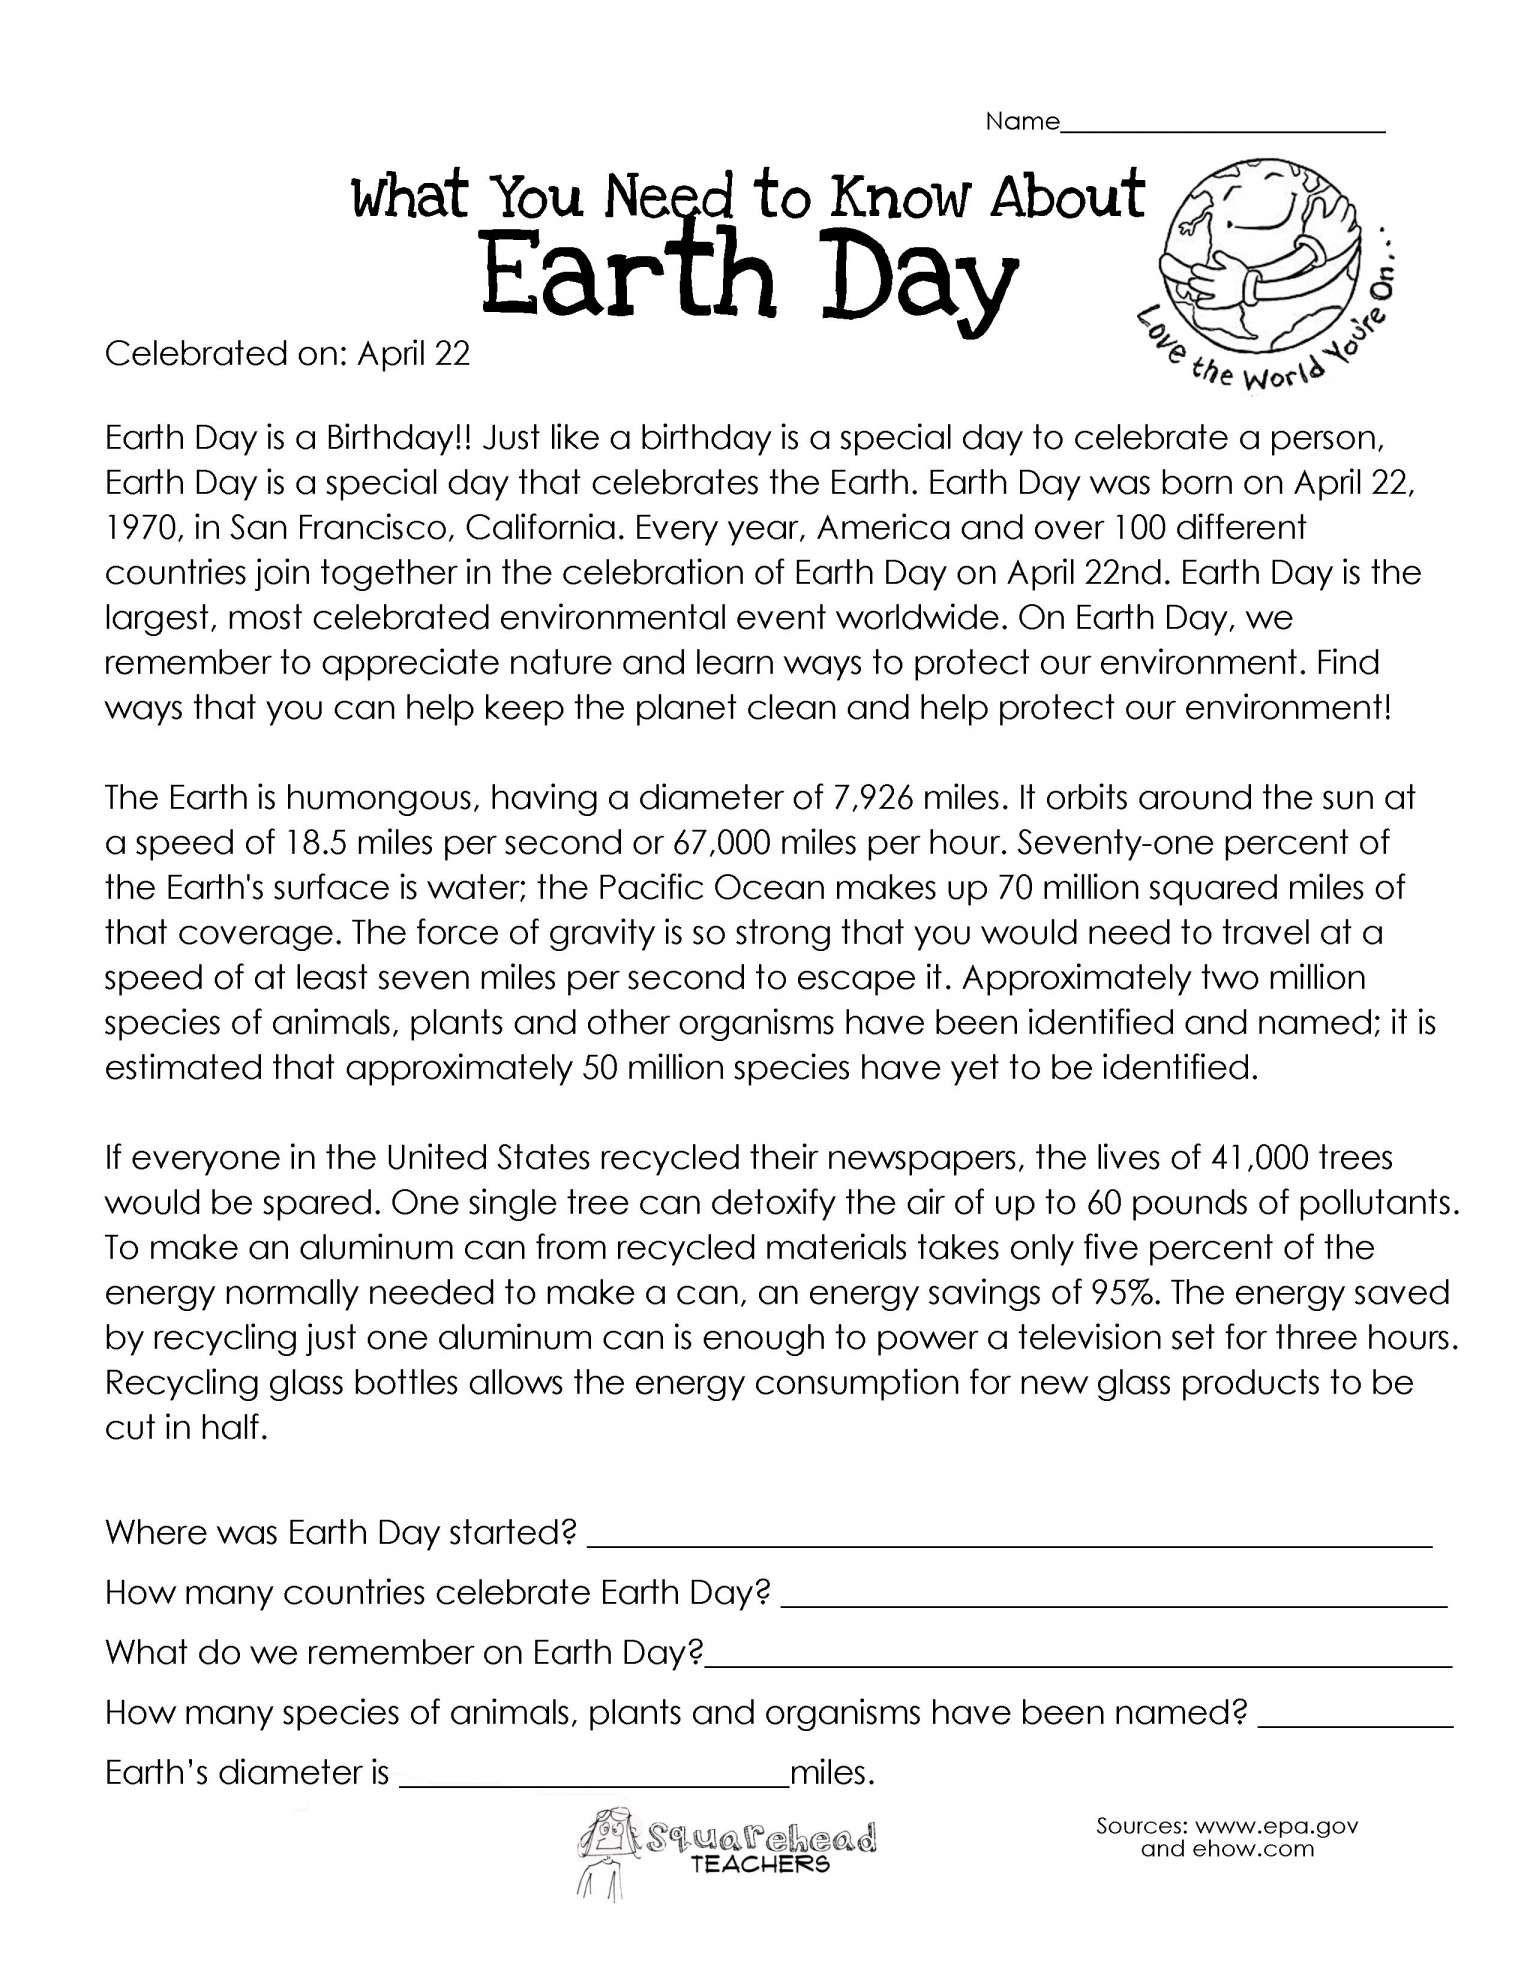 9 Earth Reading Comprehension Worksheet